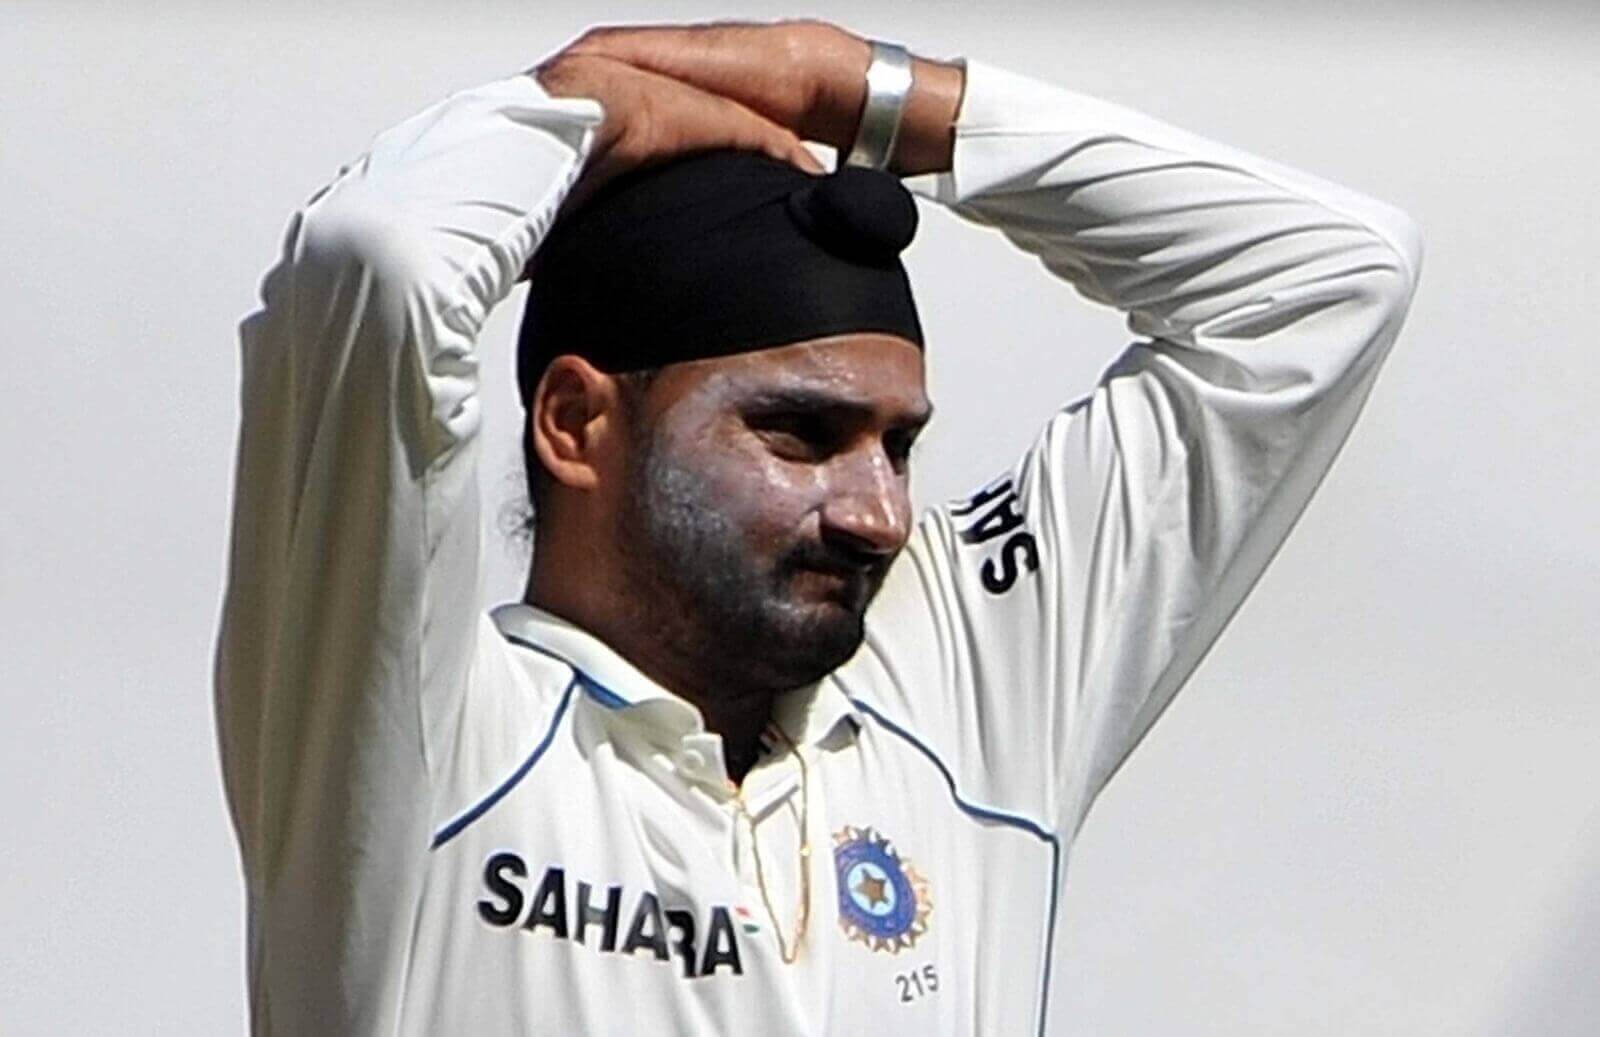 India vs Australia- Rohit Sharma Ignored, Harbhajan Singh Backs Ajinkya Rahane To Lead Team India In Australia